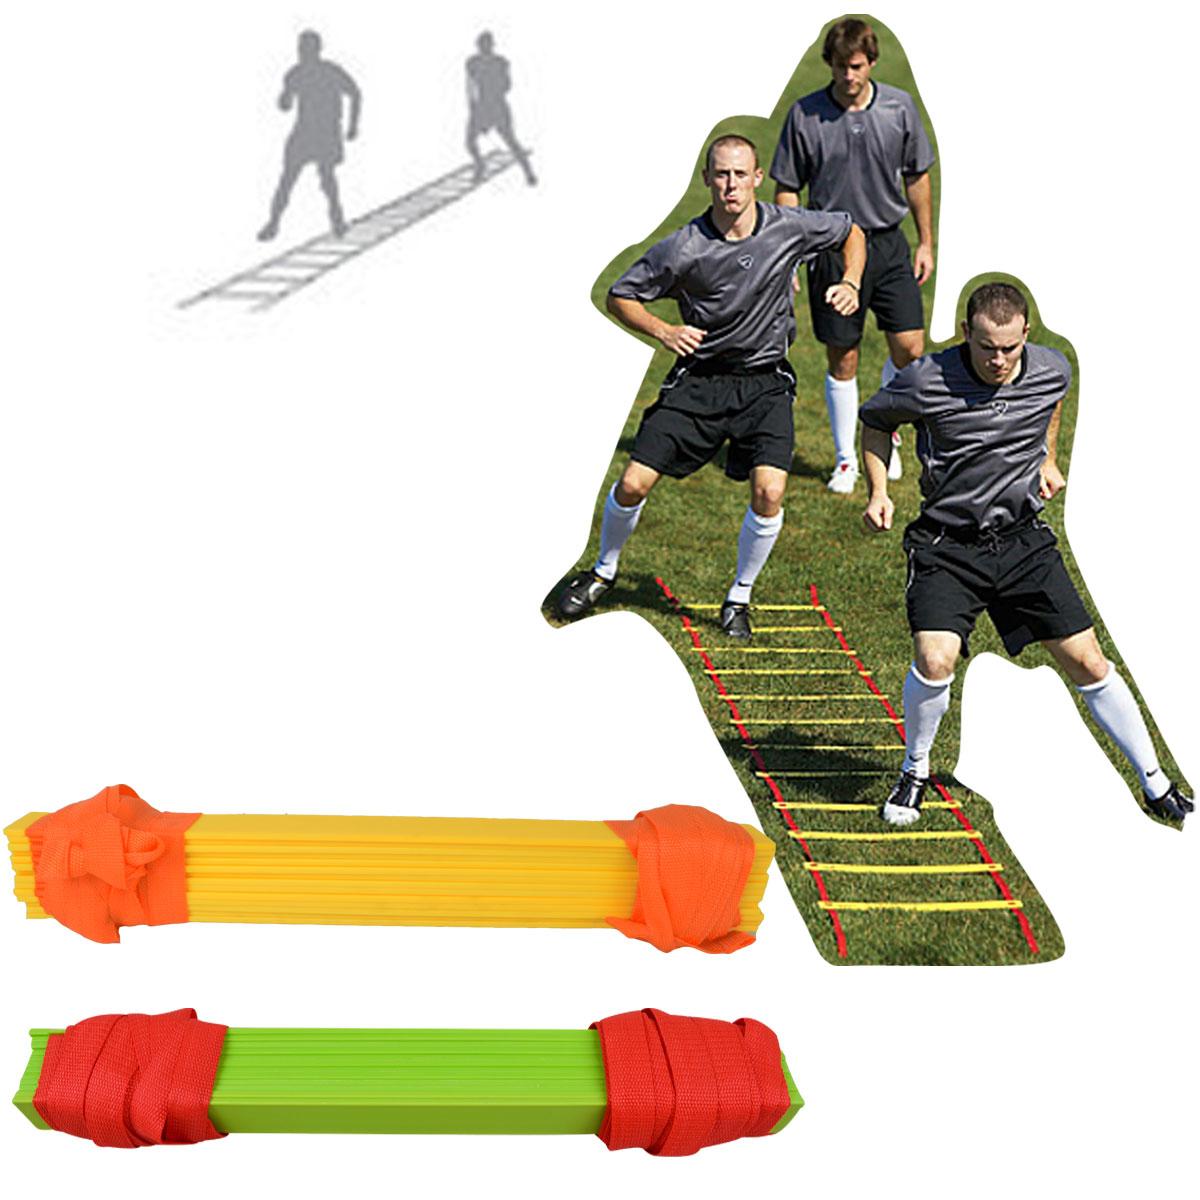 2014 Hot Sale Special Offer Sky Blue Chocolate Bola De Futebol Soccer Balls free Shipping Football Ladder Energy Folding Sport(China (Mainland))